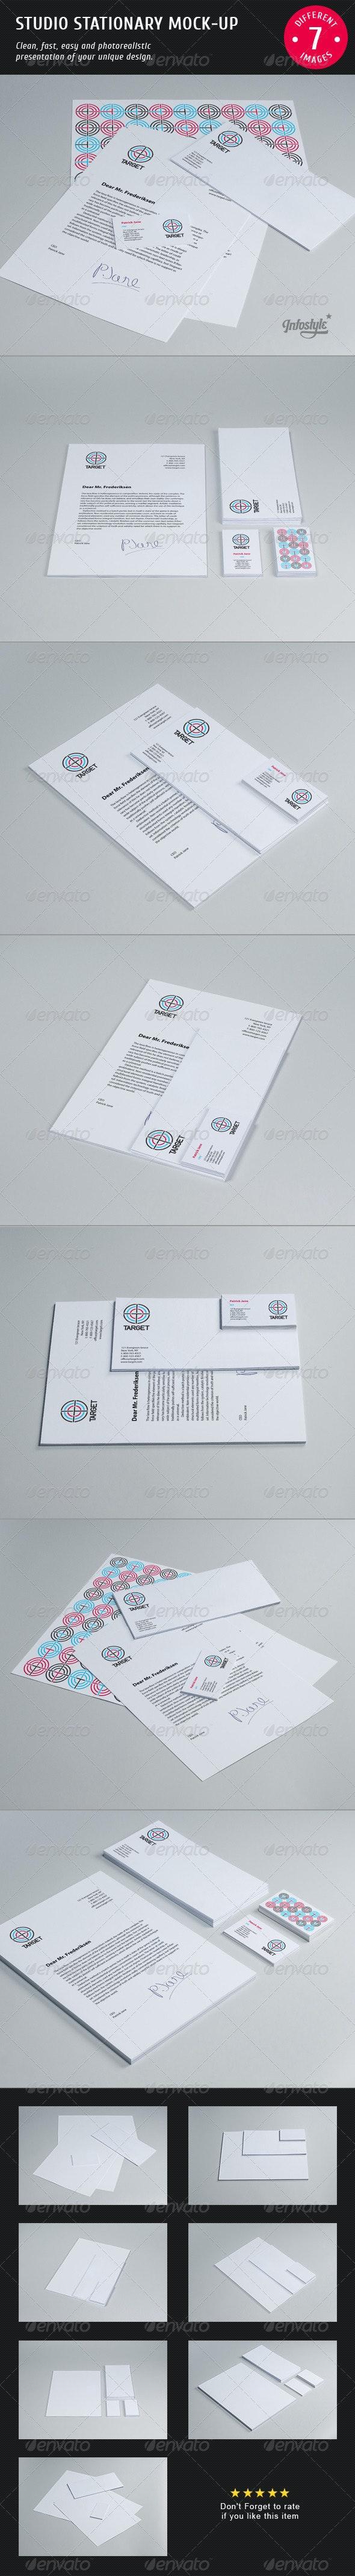 Studio Stationary Mock-up - Stationery Print